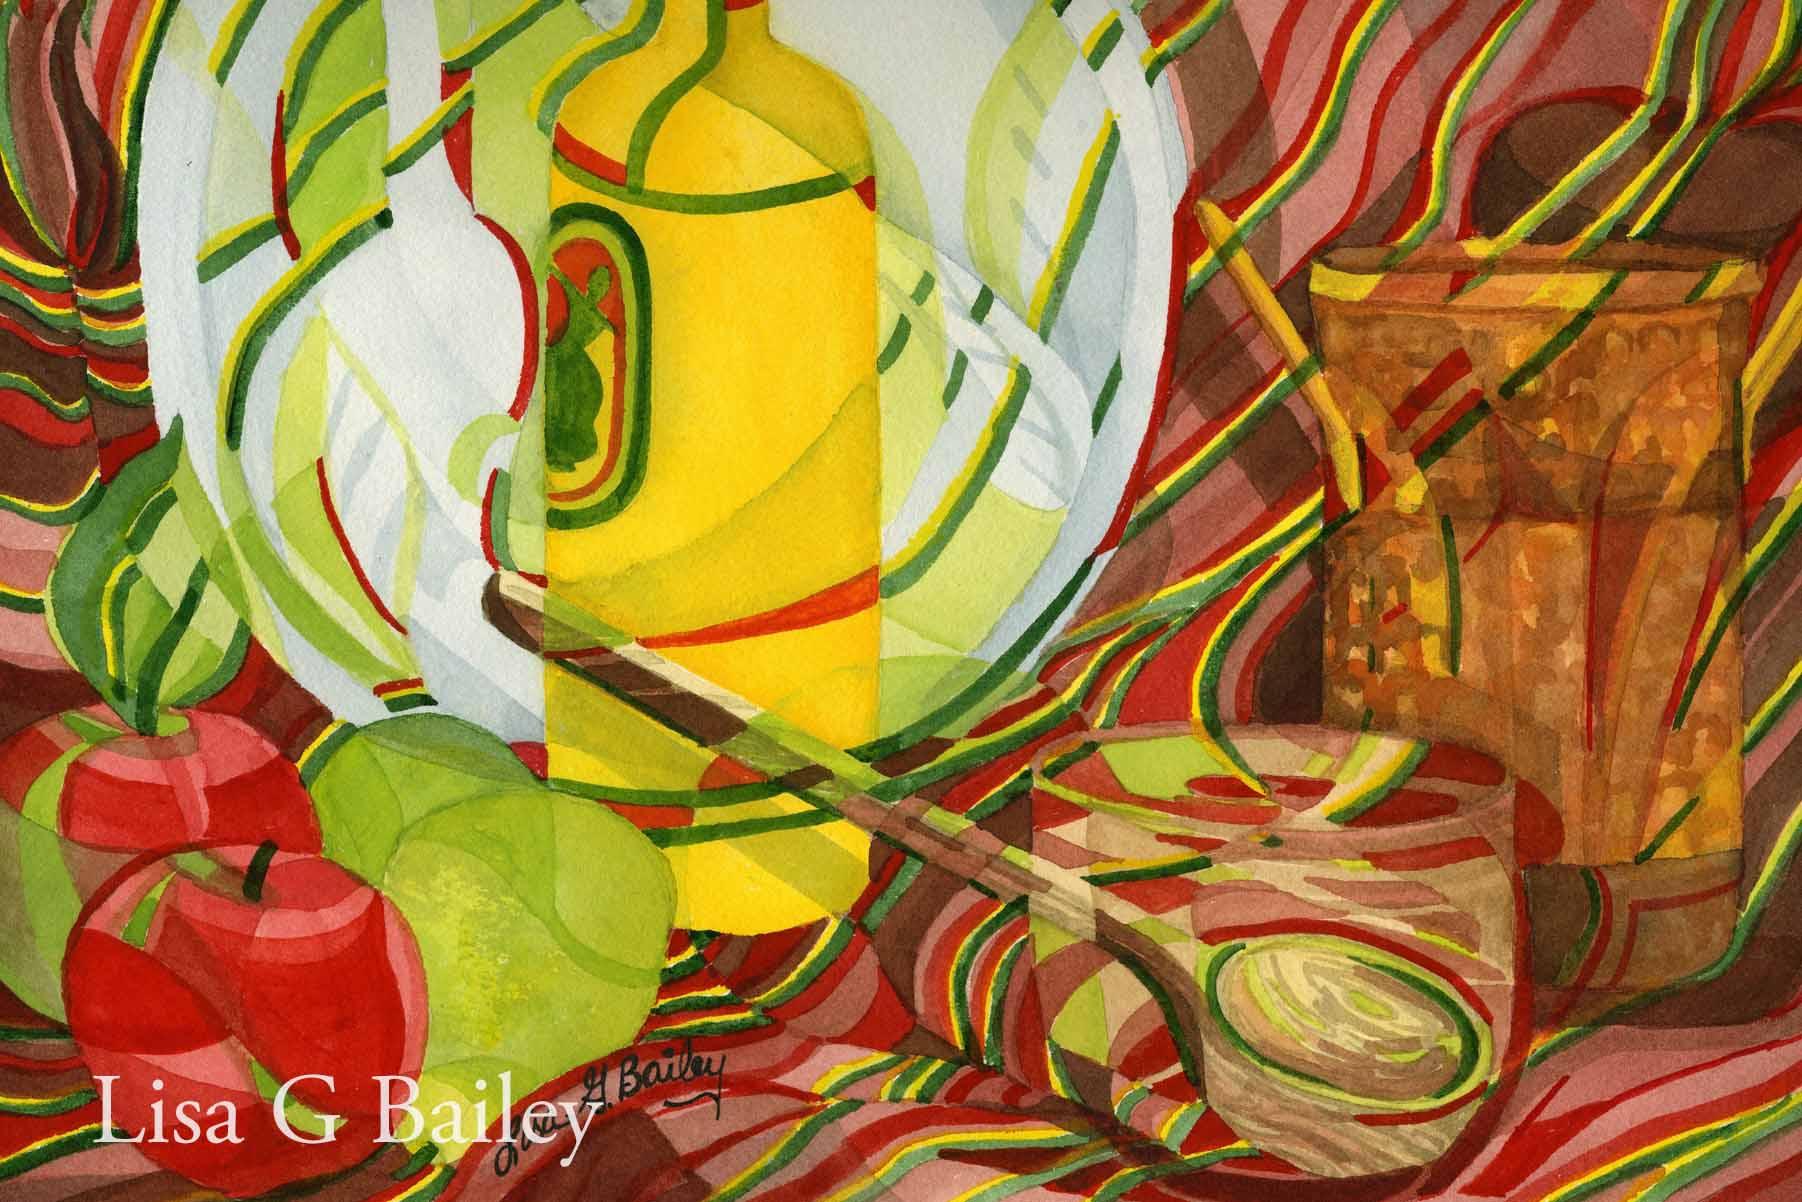 Lisa G Bailey.colorweave watercolor. Preparation